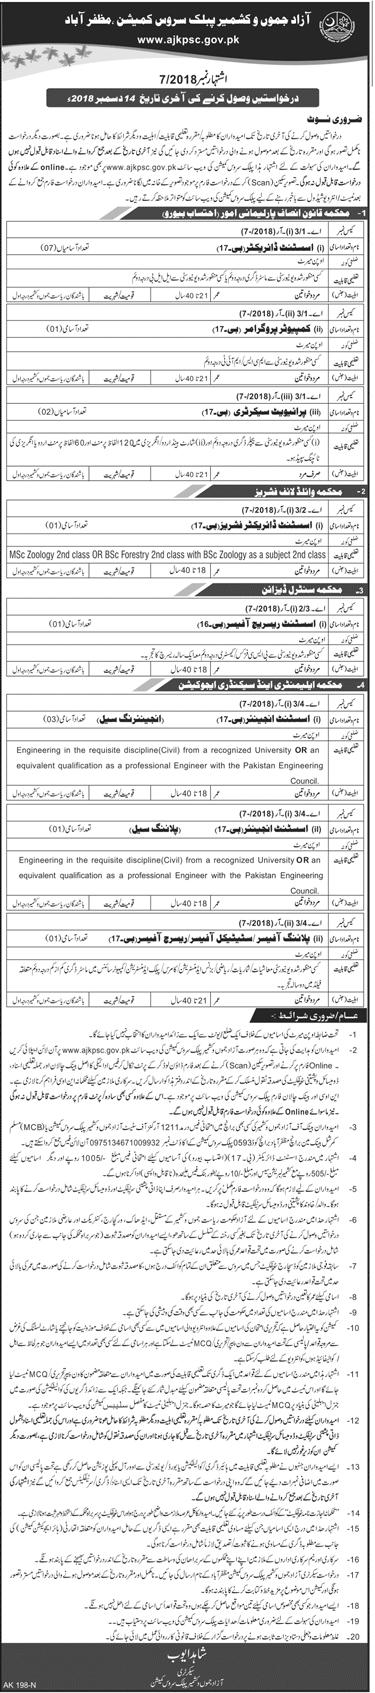 www.ajkpsc.gov.pk Jobs 2018 Advertisement No 2018